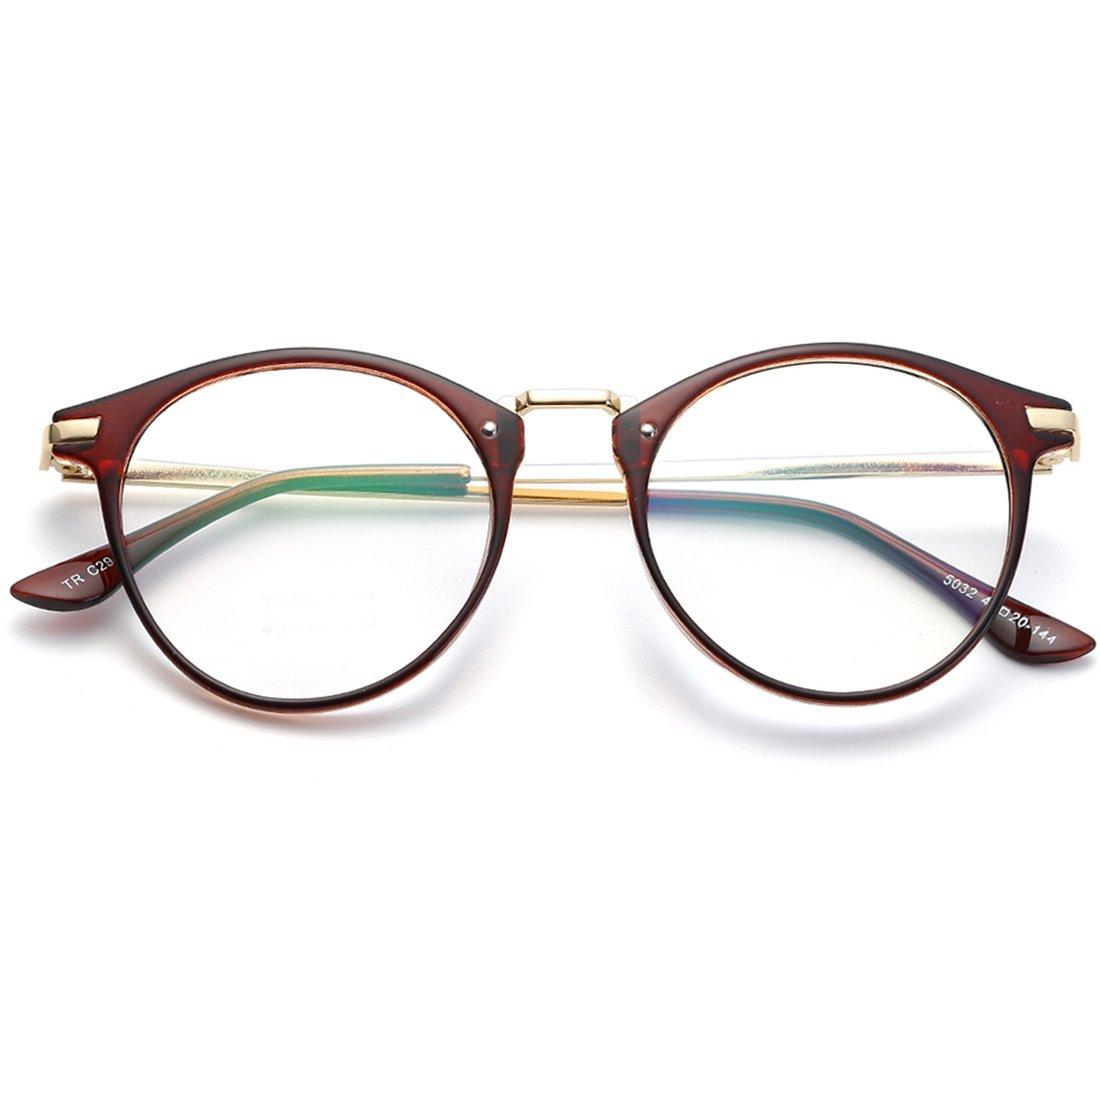 VEVESMUNDO Eyewear Retro Round Metal Frame Eyeglasses Horn Rimmed ...